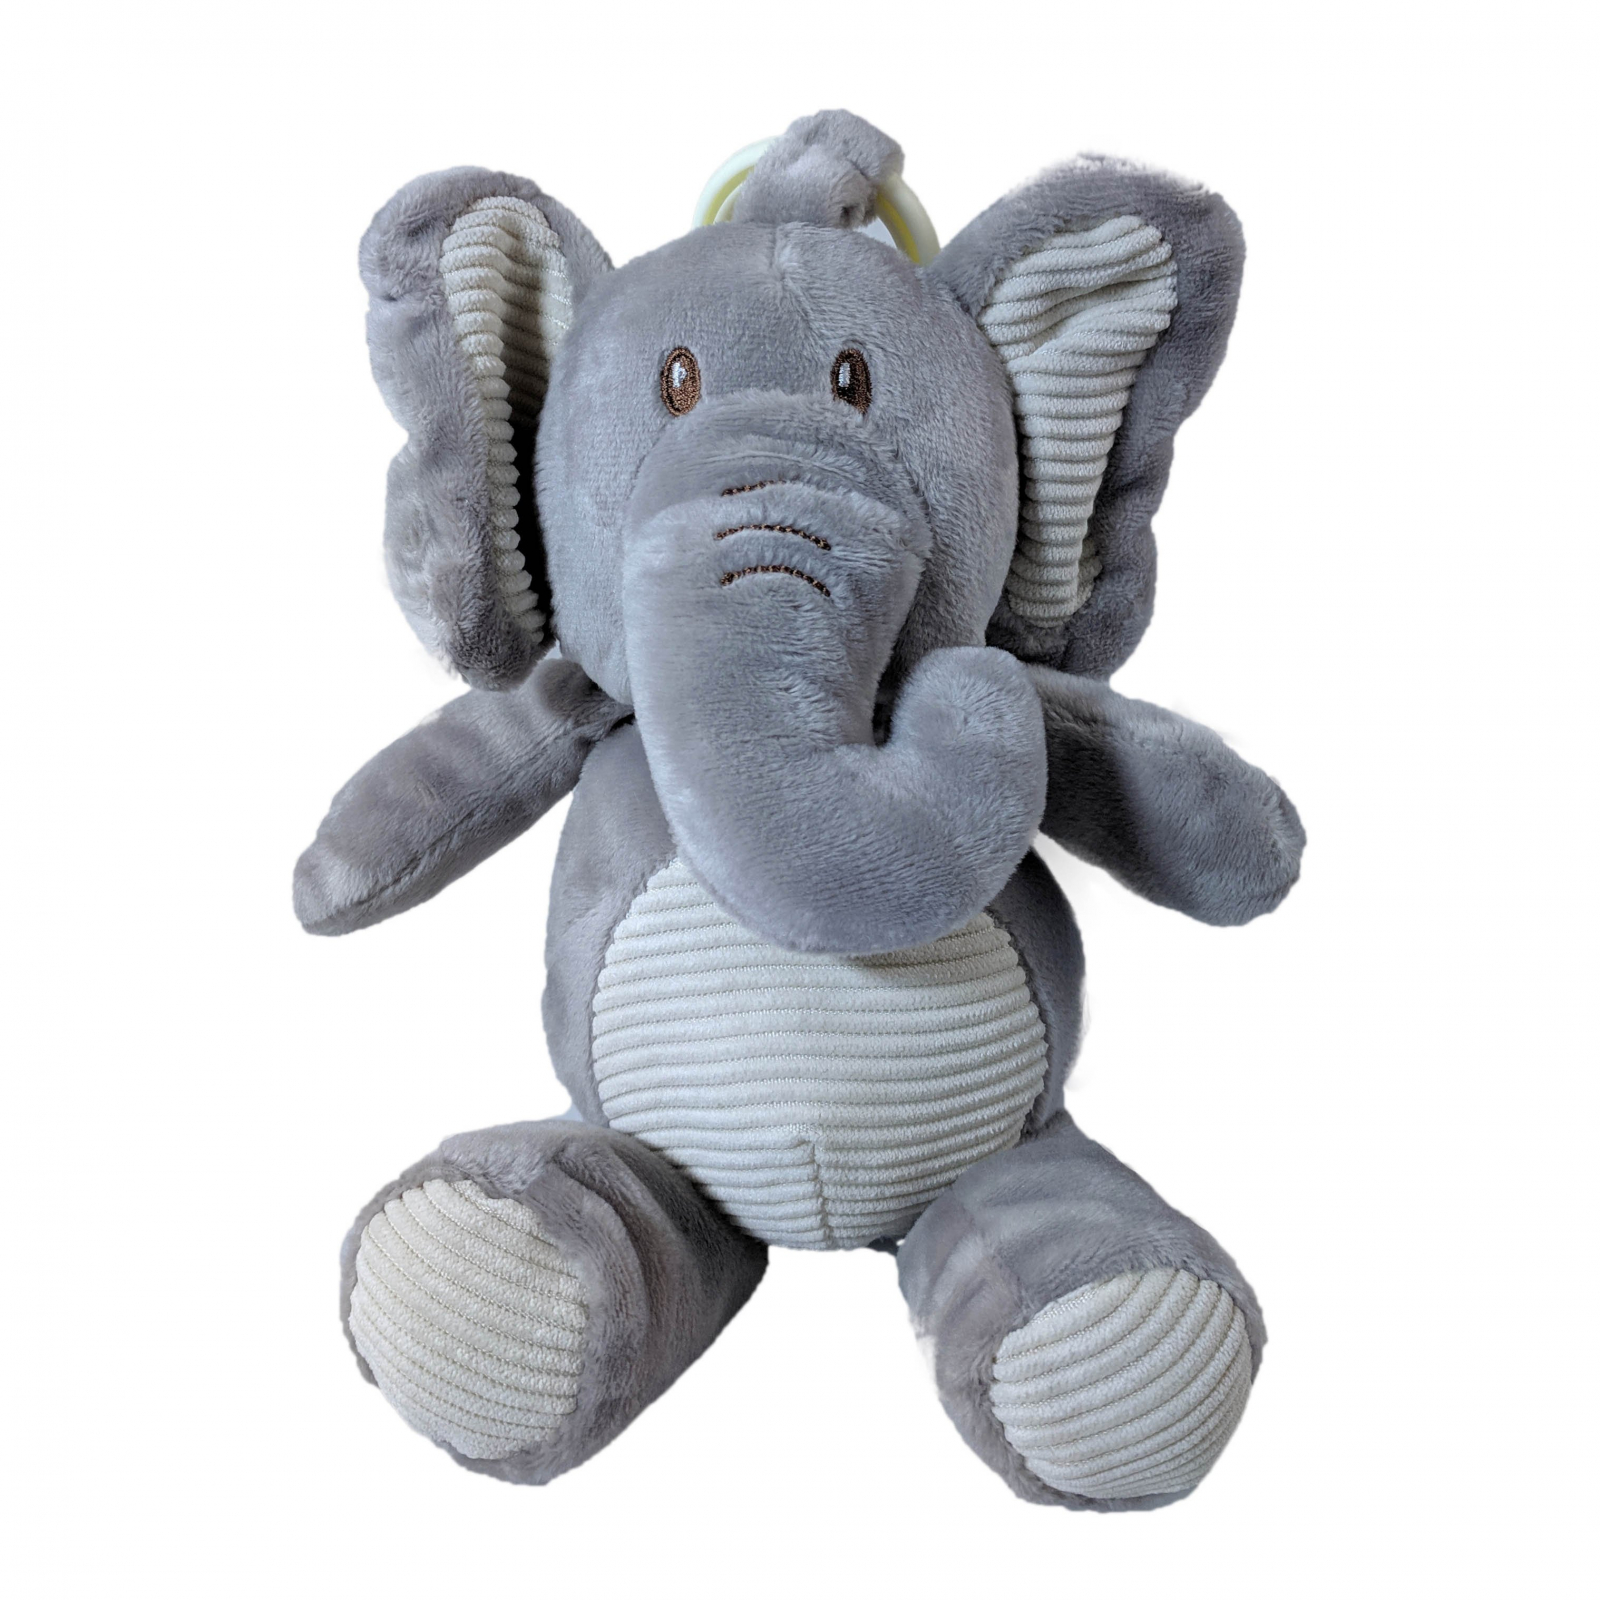 TychoTyke Clip On Baby Rattle Pram Accessory Grey Elephant